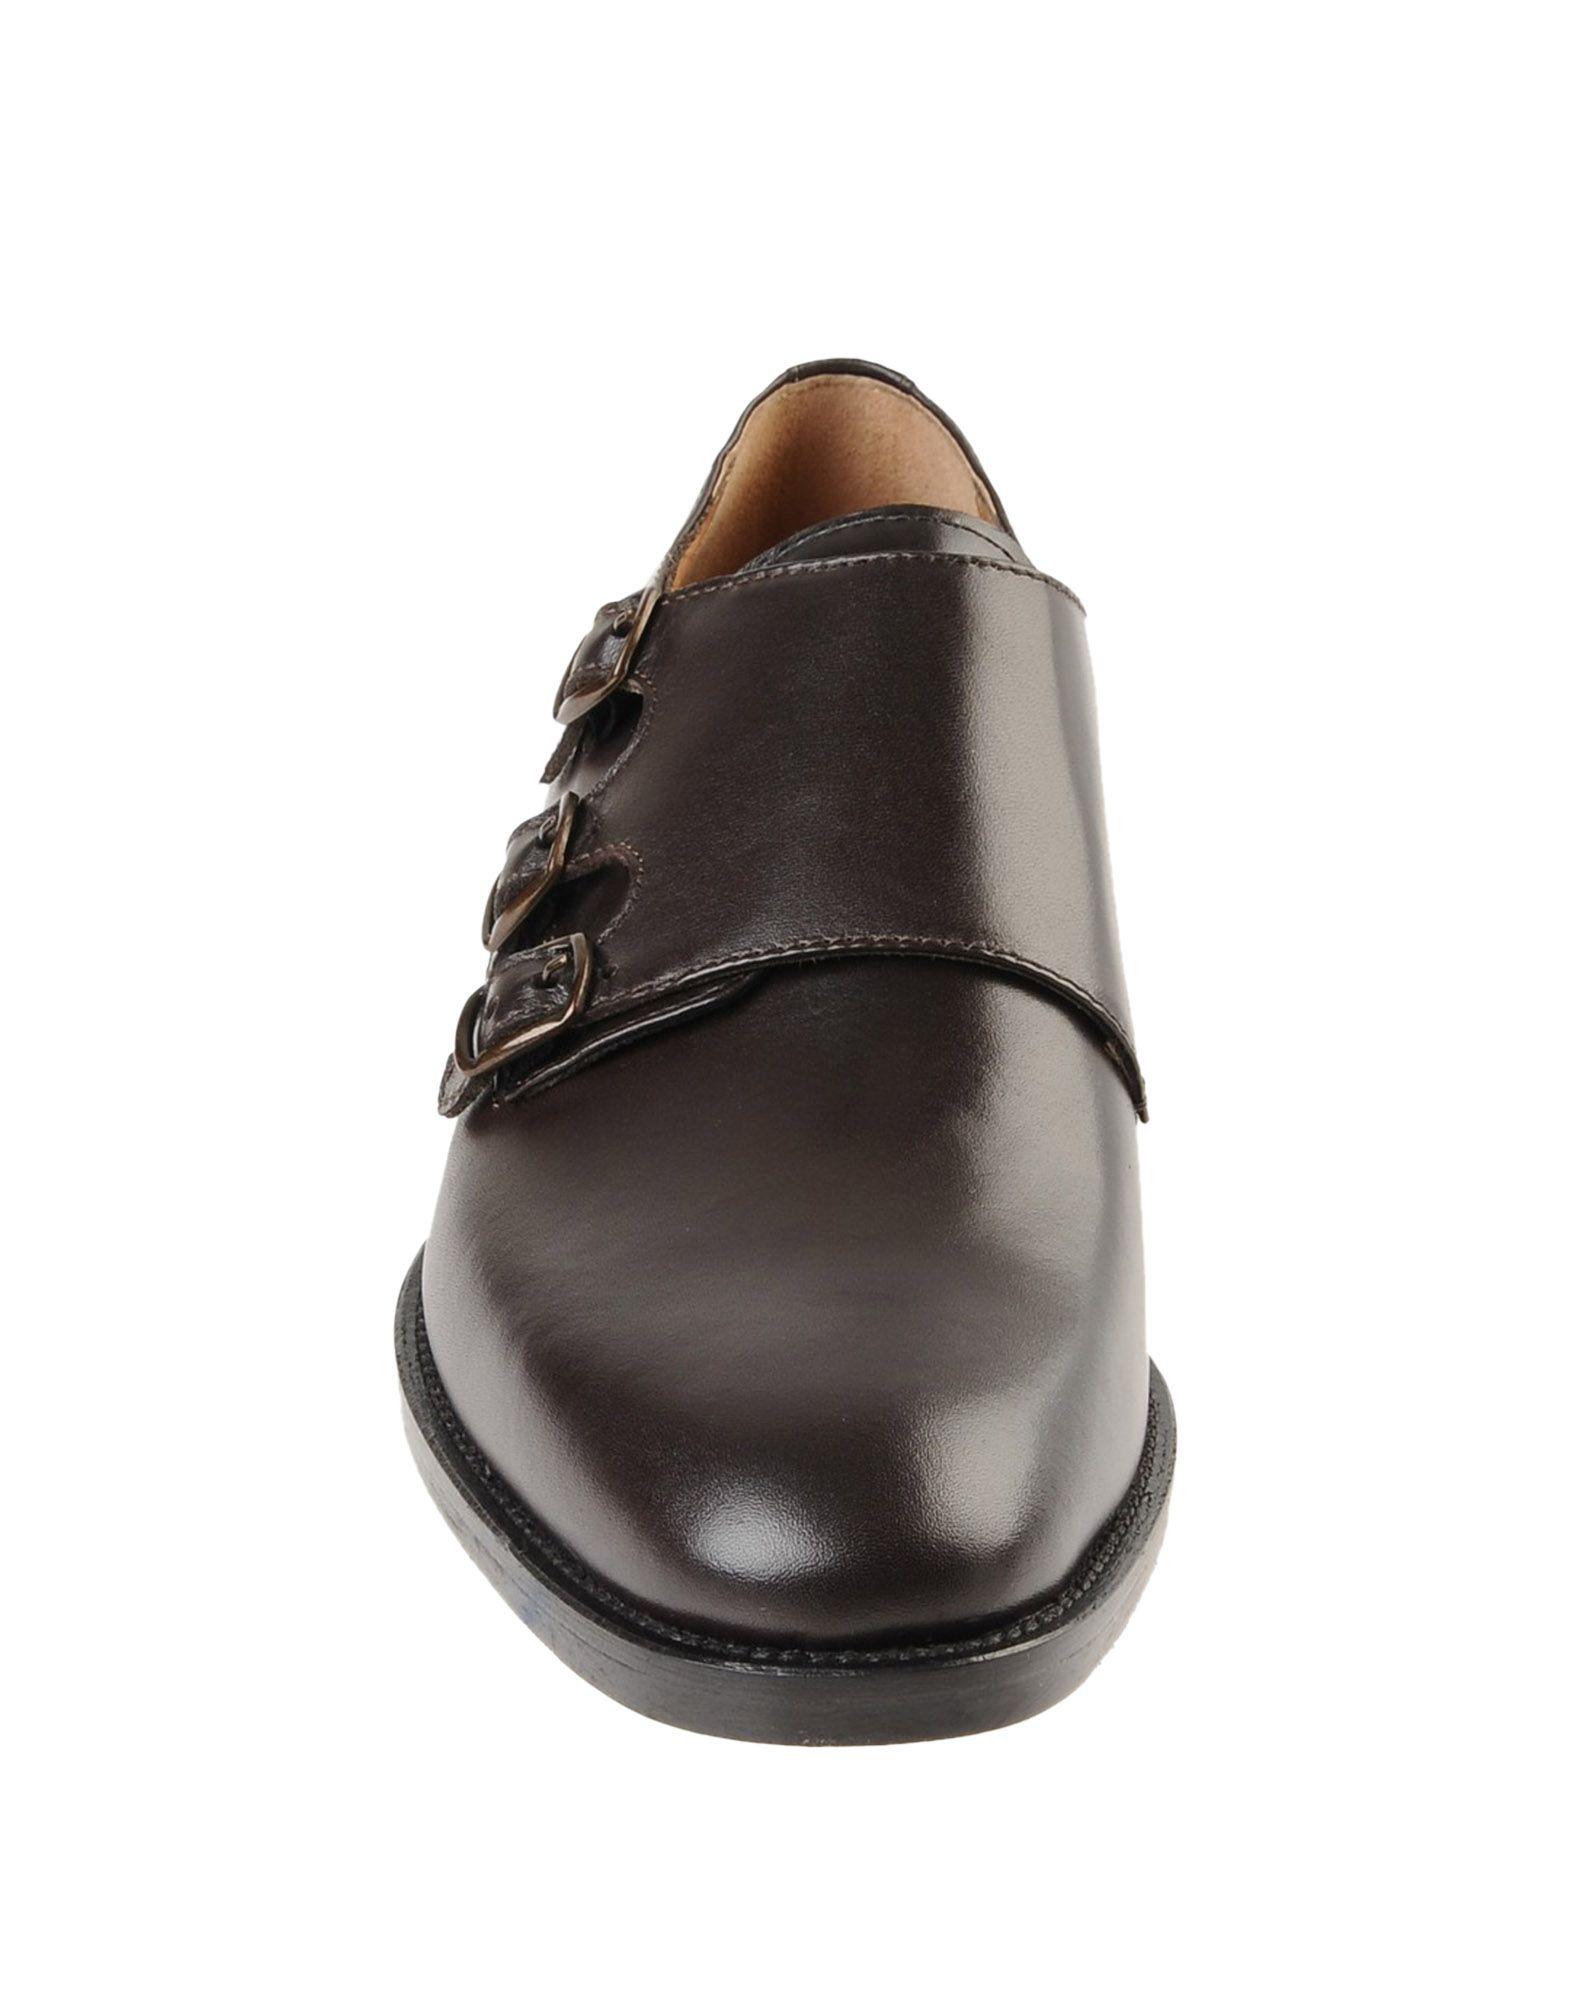 Leonardo Principi Mokassins Herren beliebte  11542213WE Gute Qualität beliebte Herren Schuhe 7af6d1